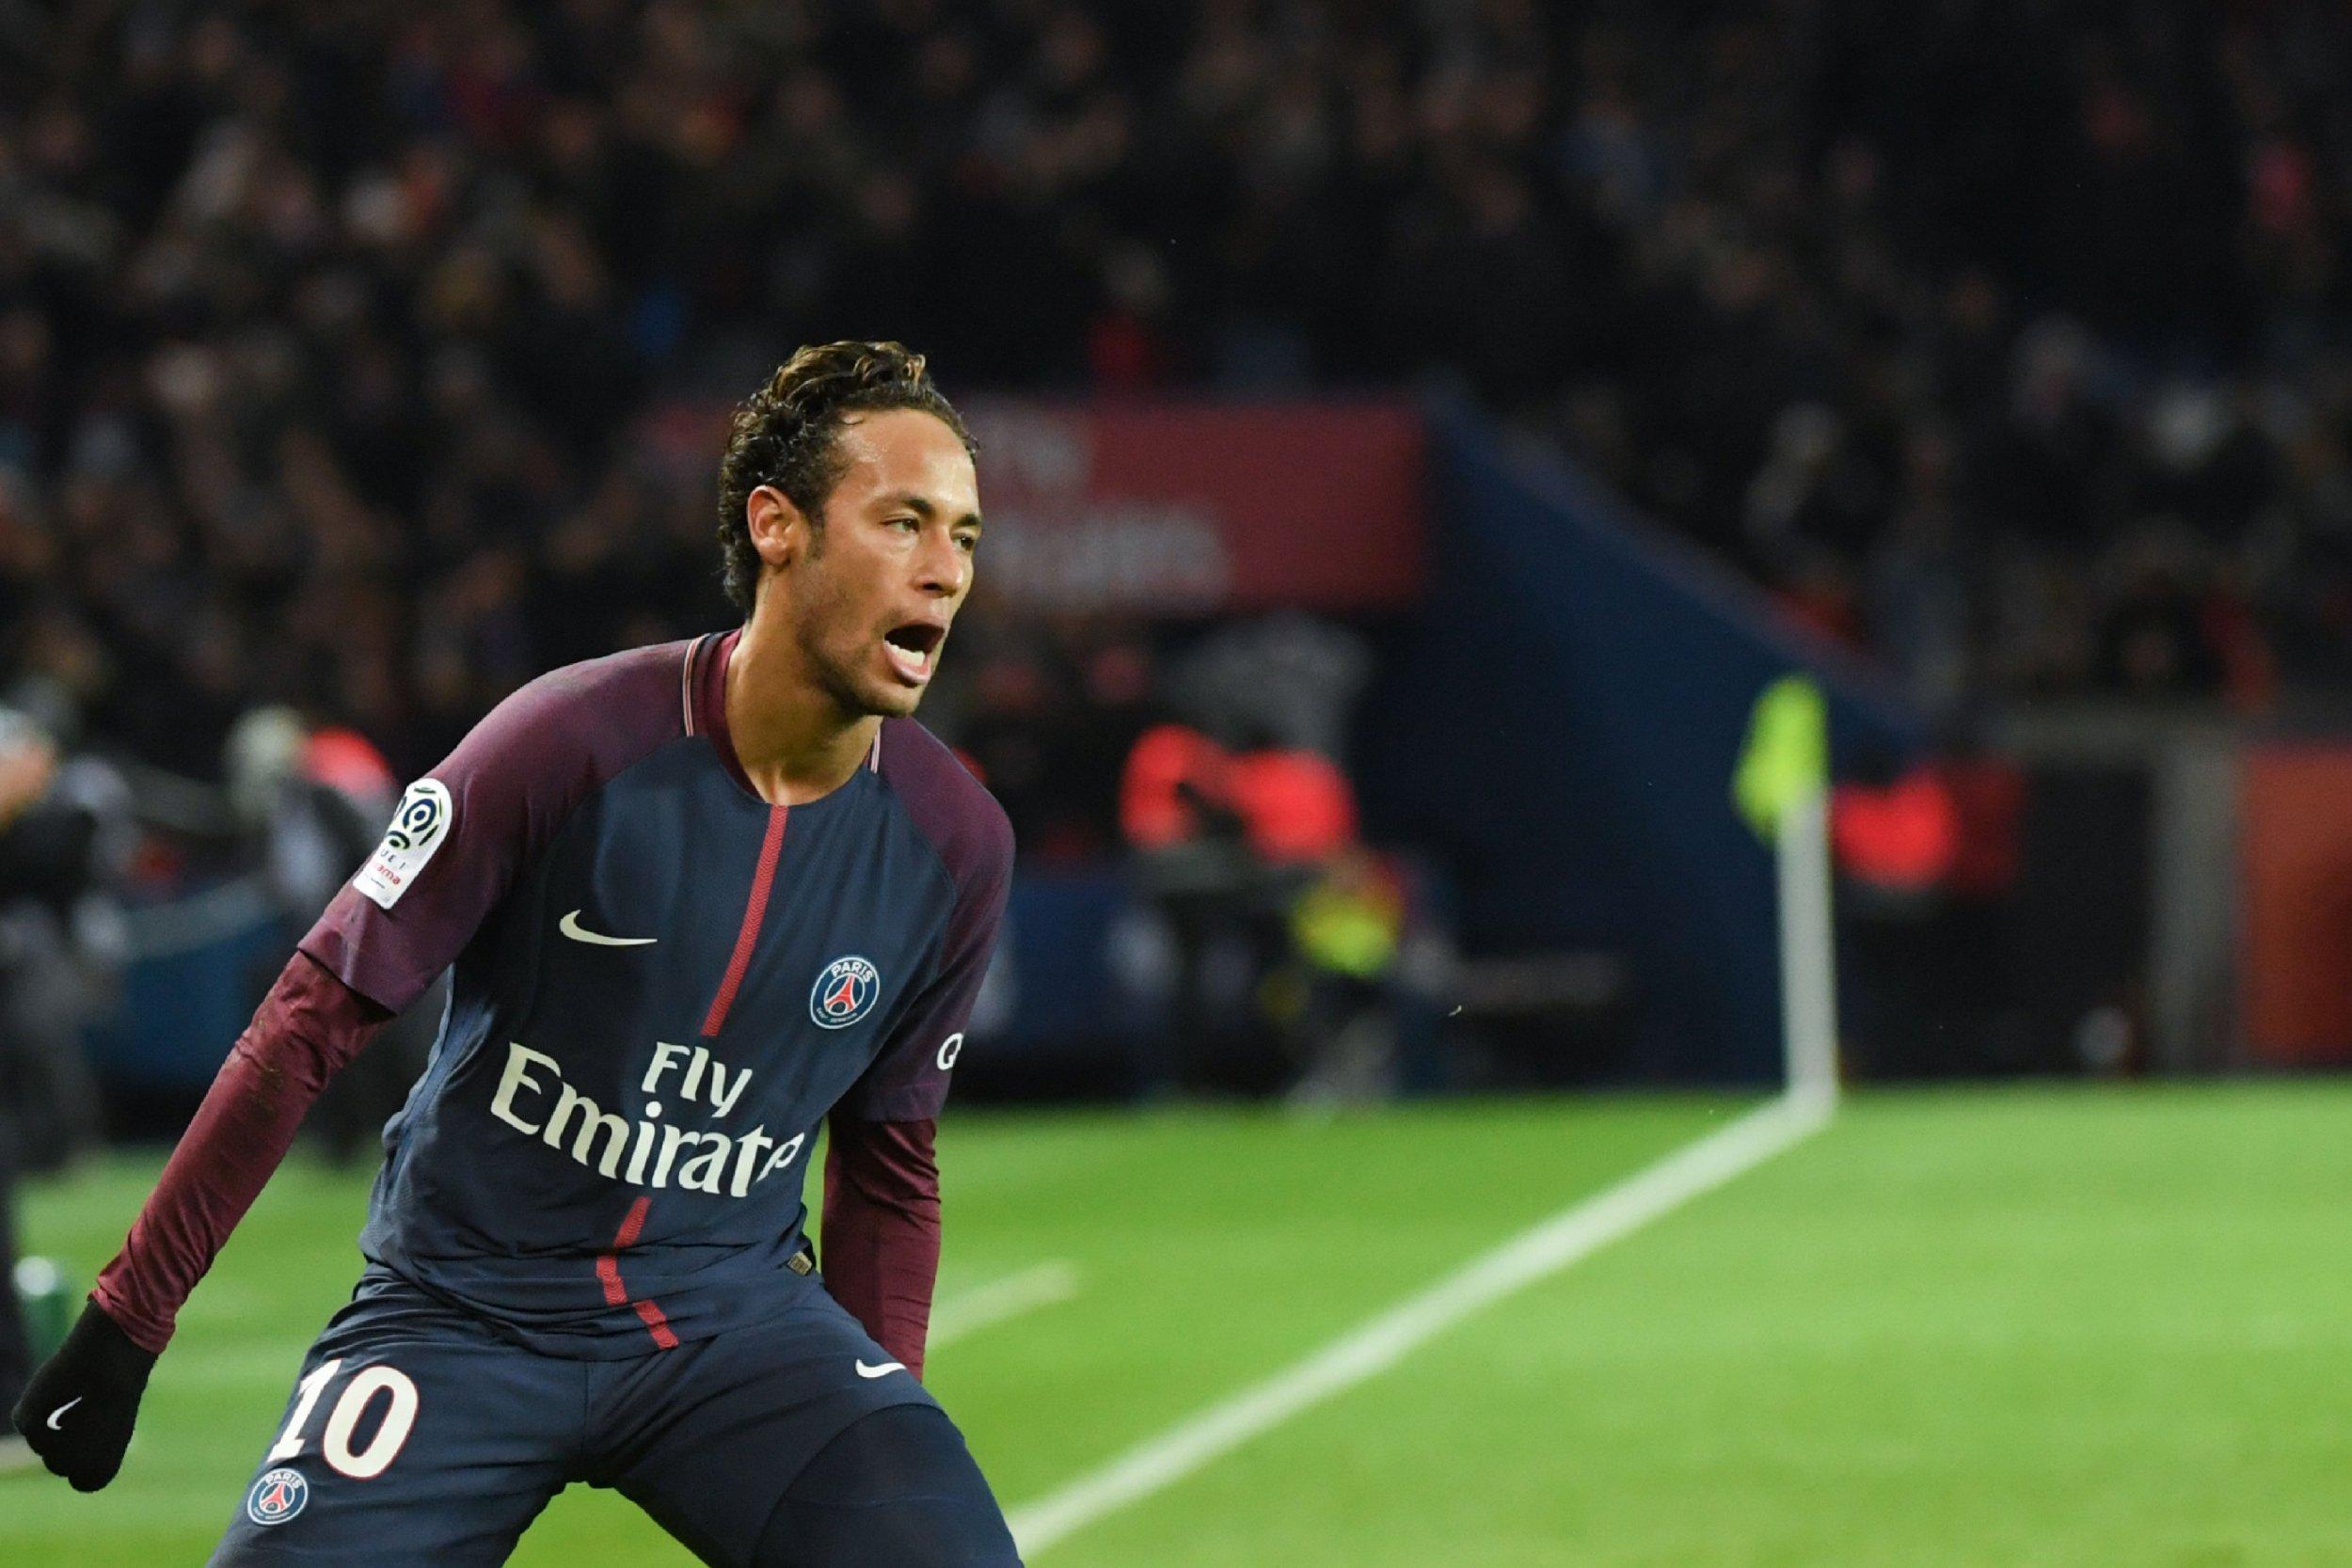 Paris Saint-Germain fans boo Neymar for denying Edinson Cavani record-breaking goal